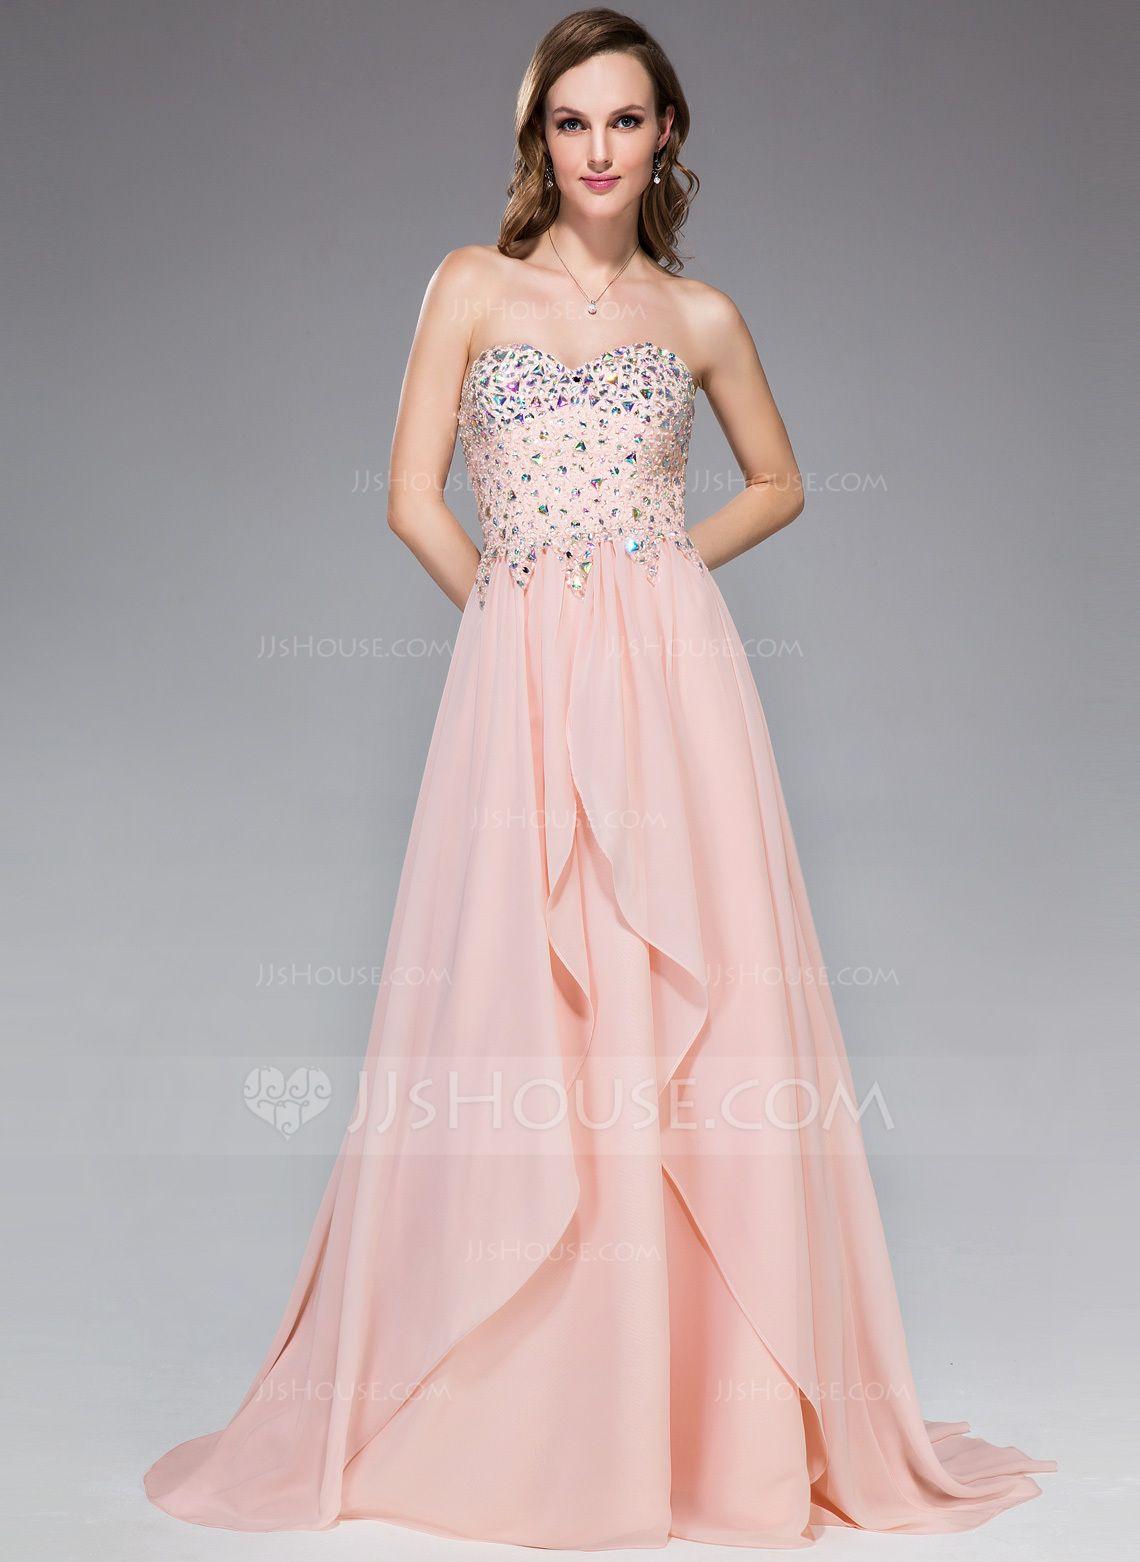 Alineprincess sweetheart sweep train chiffon prom dress with